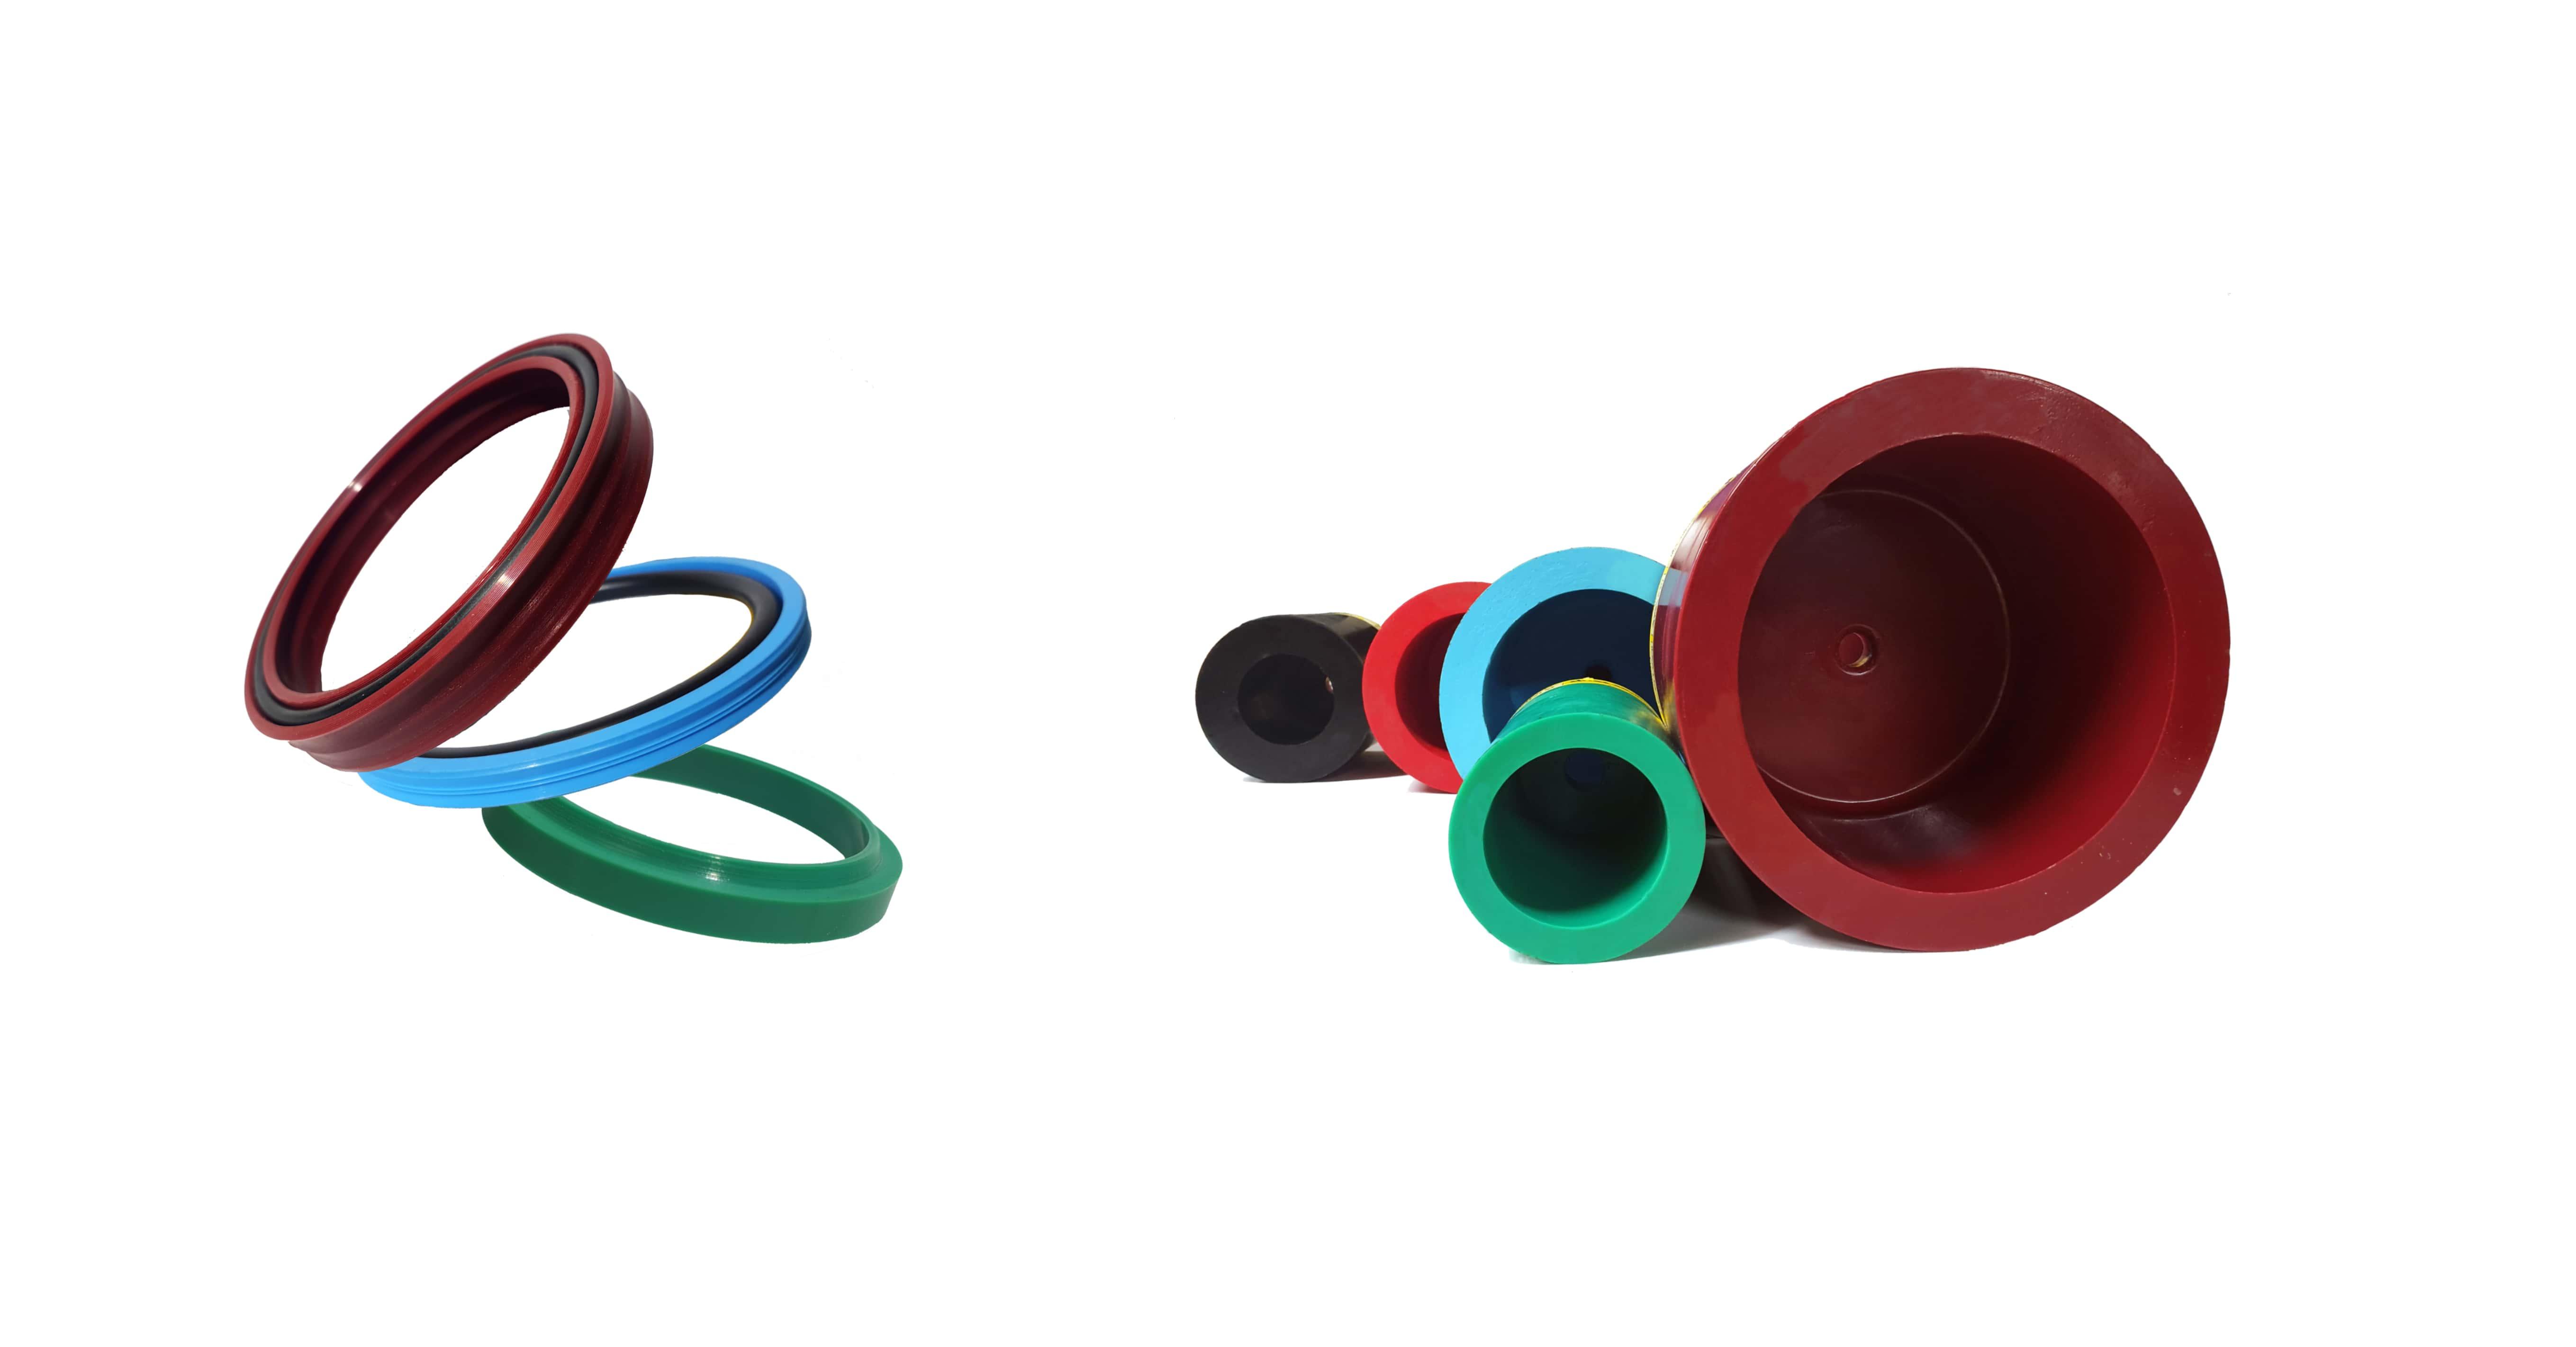 Oz Seals Hydraulic Pneumatic Sealing Solutions